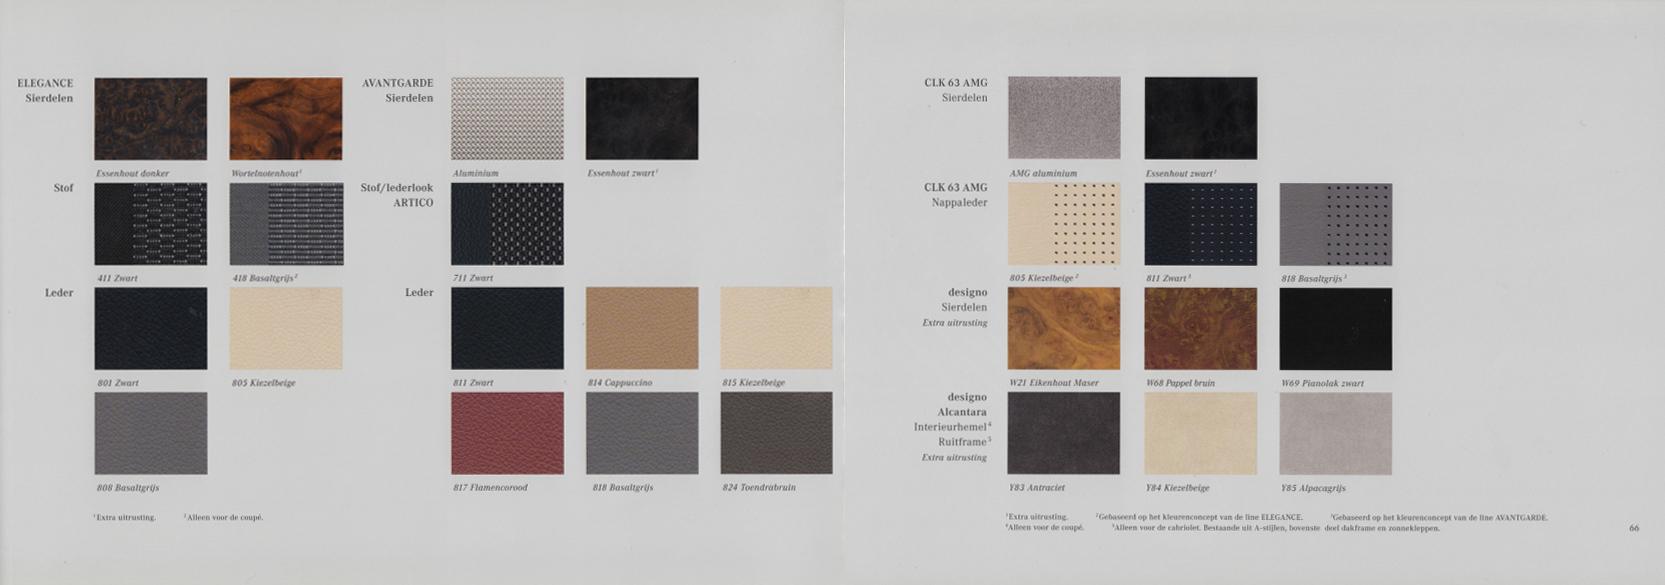 (A/C209): Catálogo 2006 - neerlandês 034